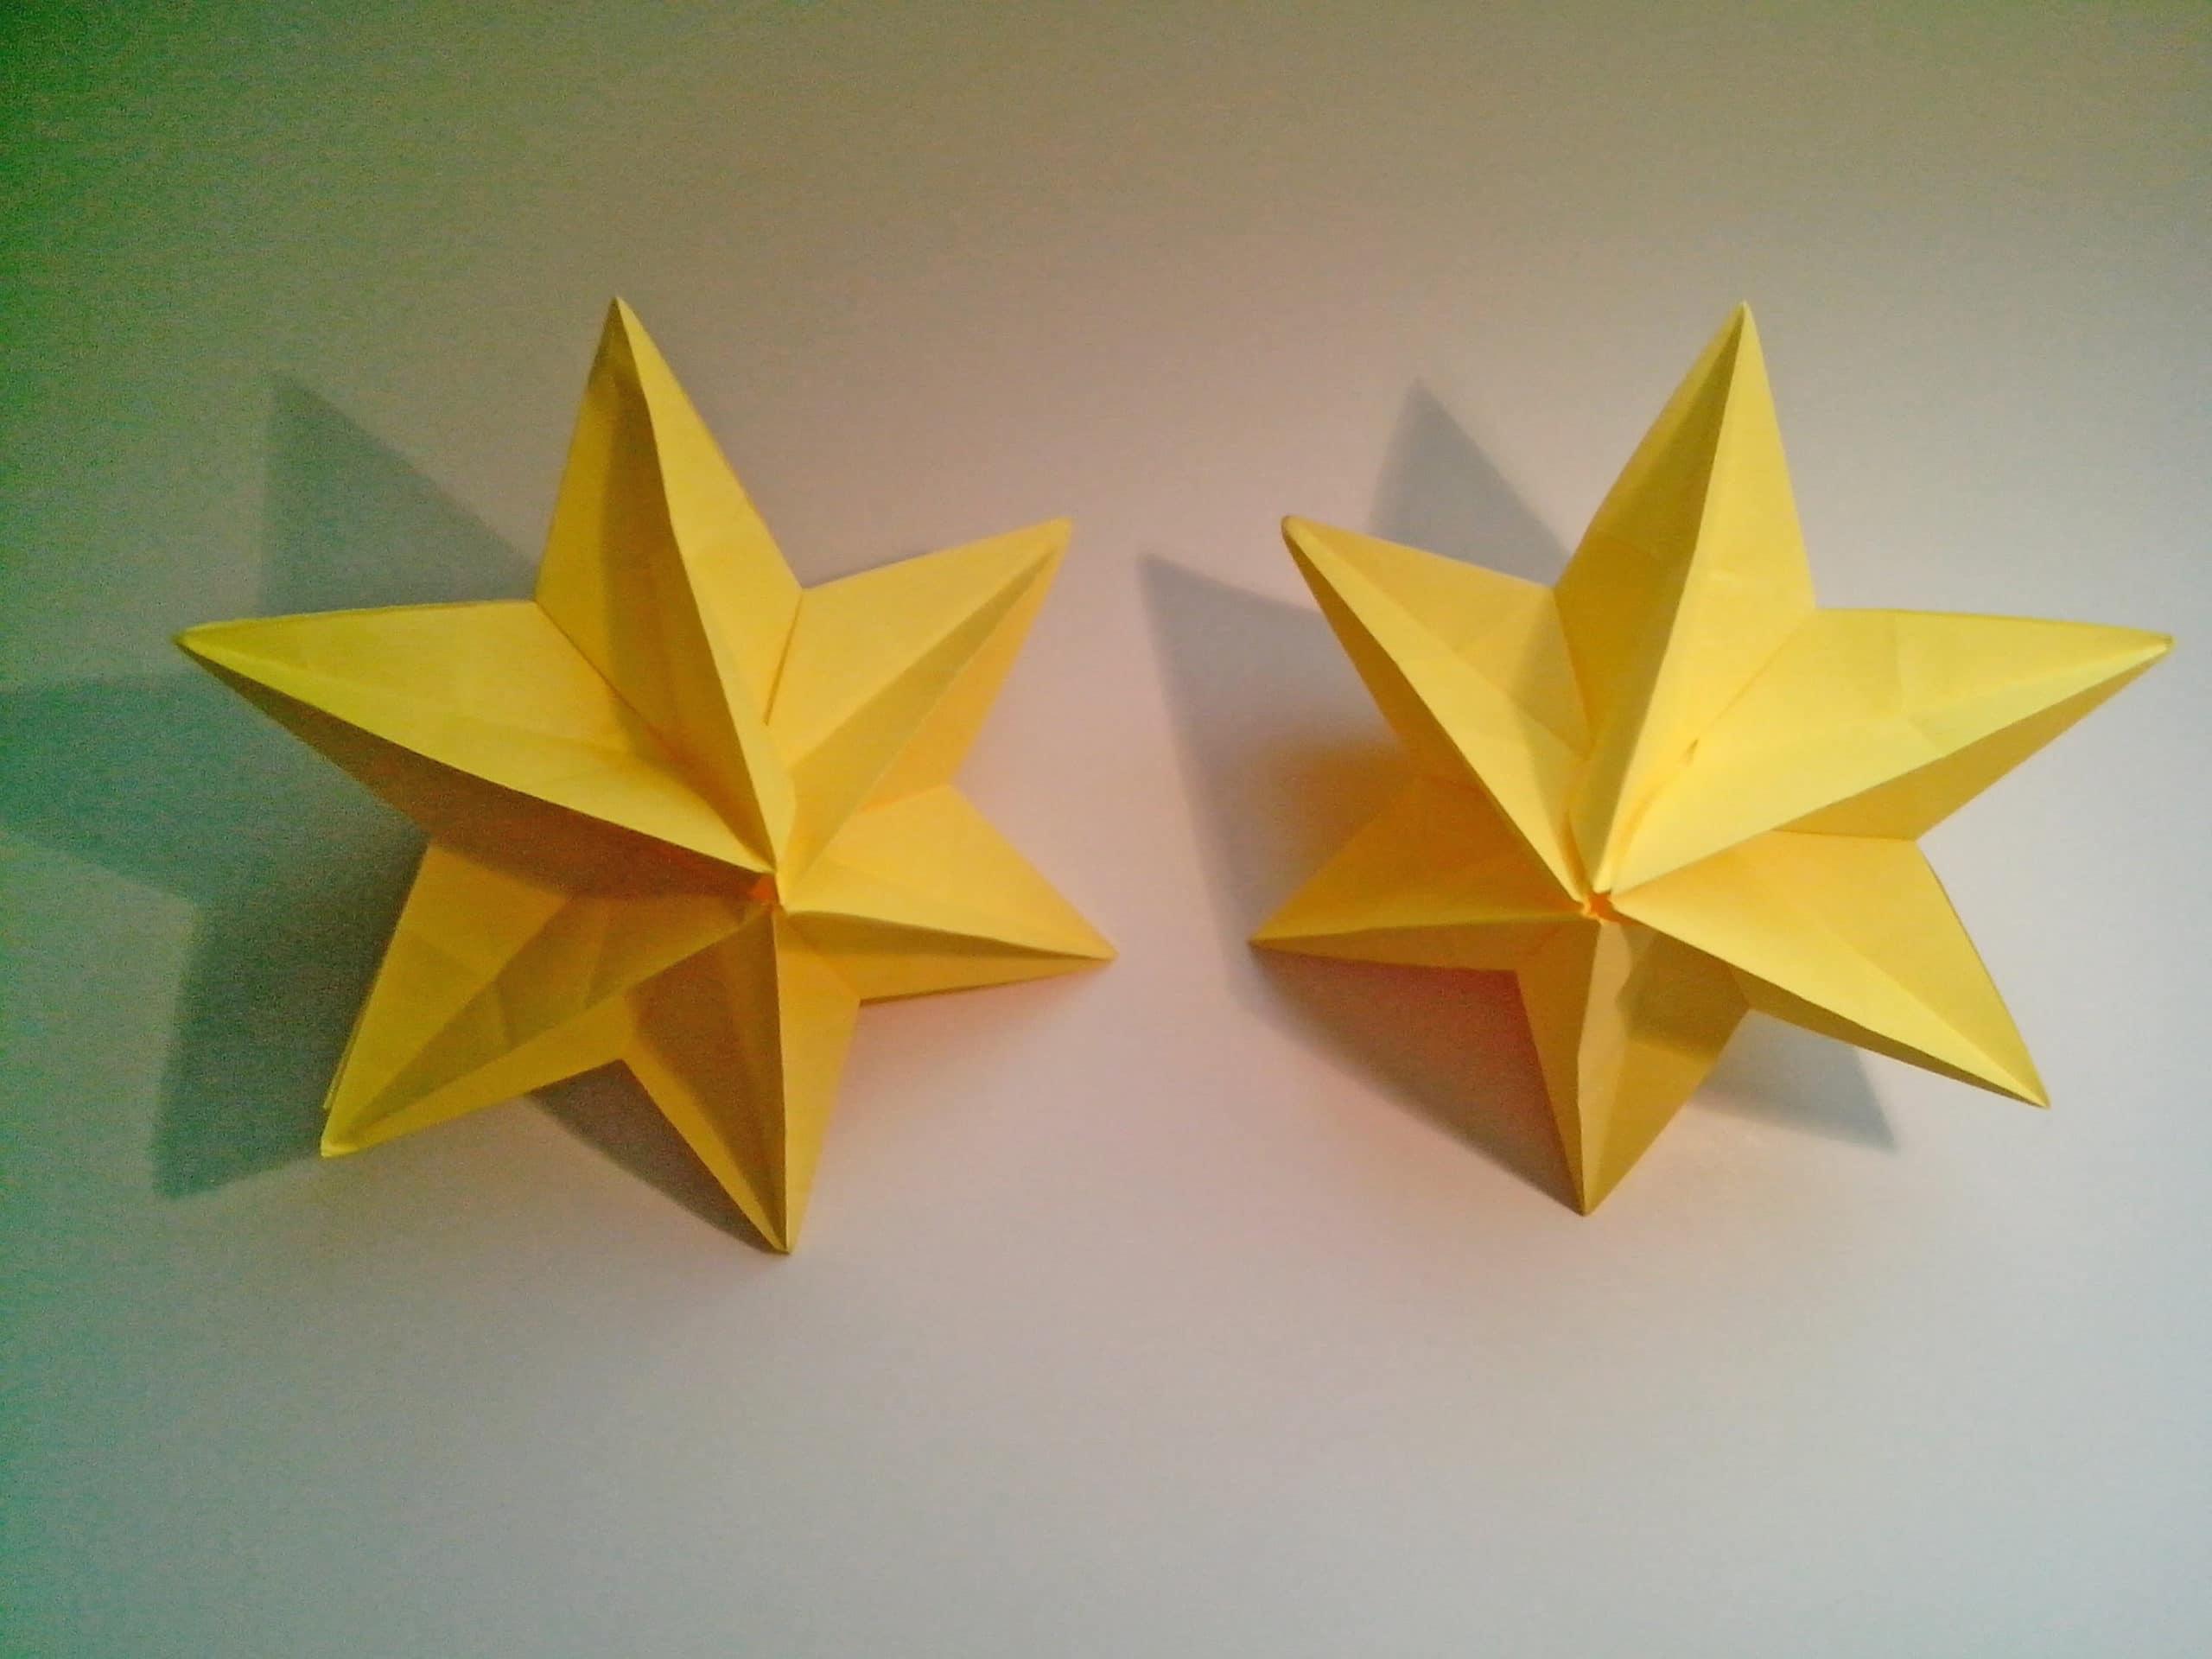 Estrella 3d de navidad de papel for Decoracion navidena con papel